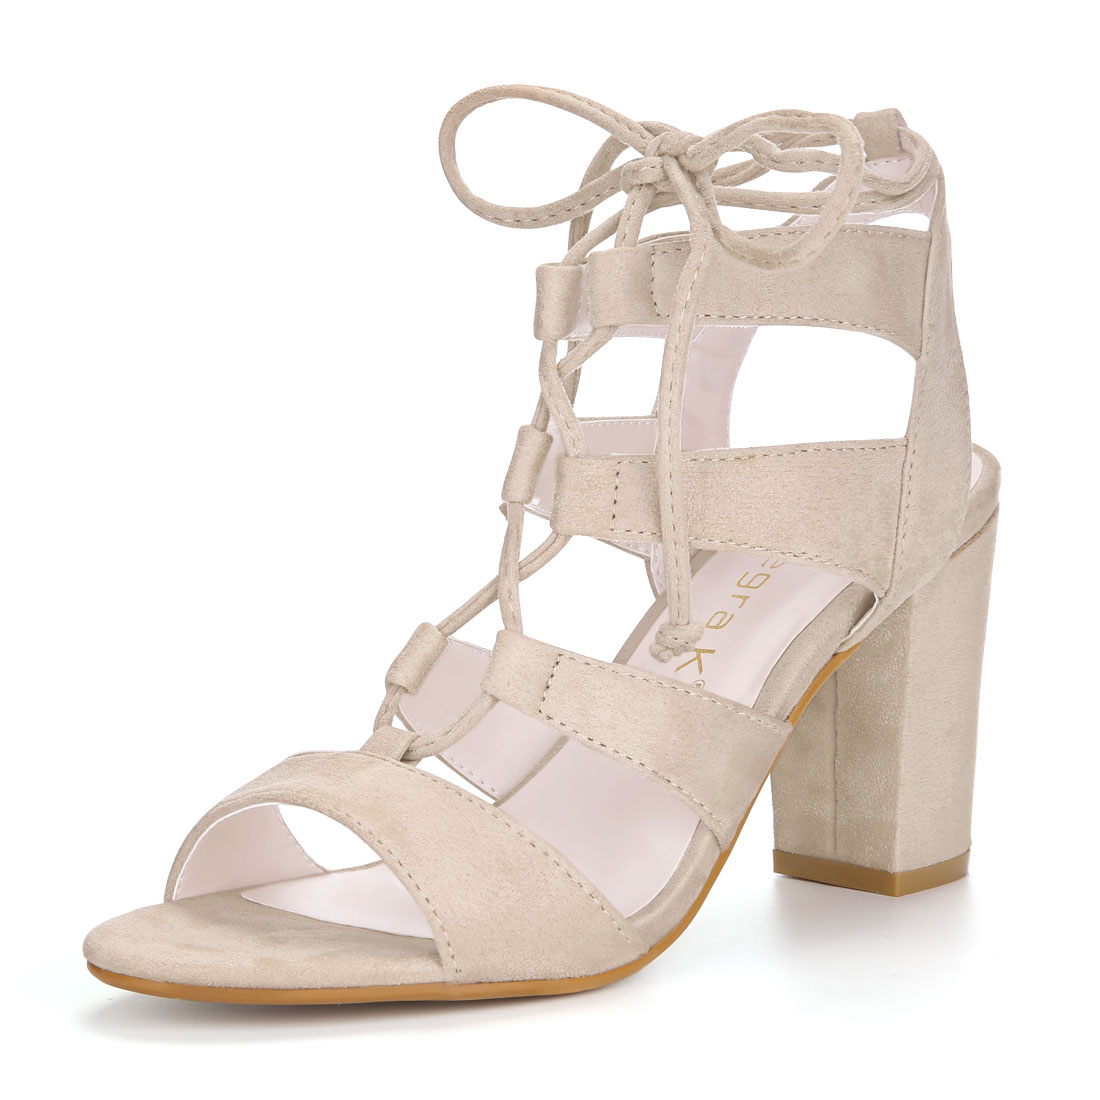 Allegra K Women's Tie Up Strappy Gladiator Block Heel Sandals Red US 9